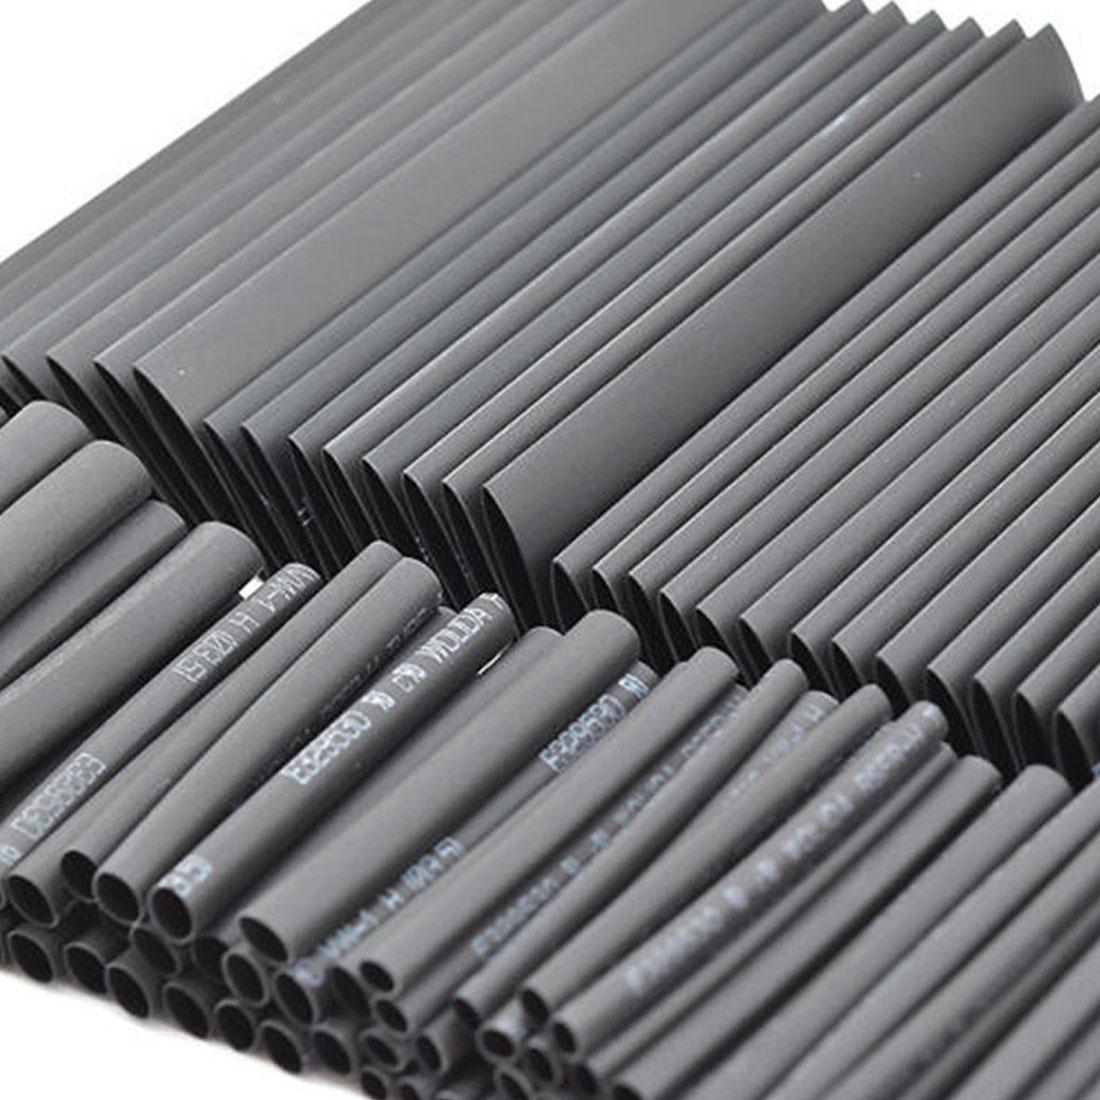 Купить с кэшбэком Hot 127pcs 2:1 7 Sizes Assortment Polyolefin Halogen-Free Heat Shrink Tubing Tube Sleeving Wire Cable Kit